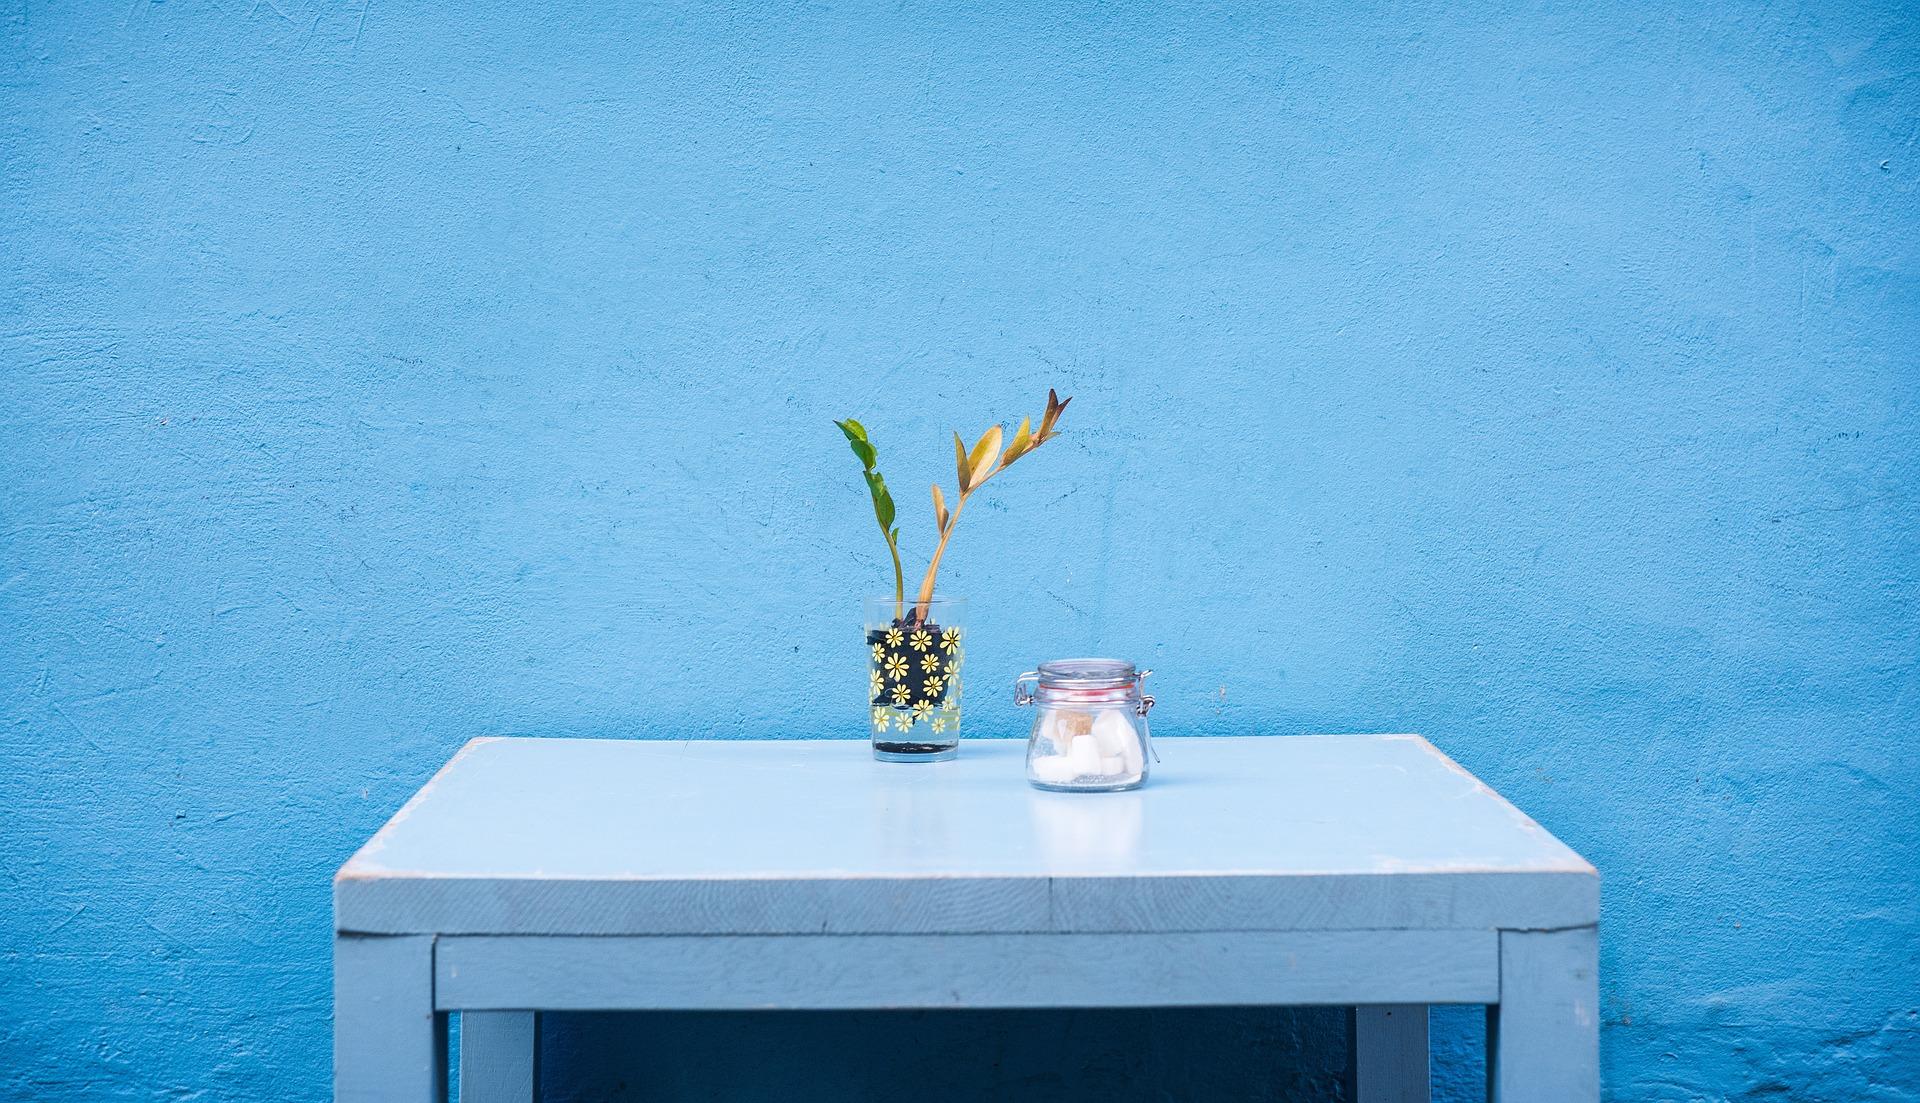 9 Padu Padan Warna Yang Cocok Dengan Dekorasi Biru Di Dalam Rumah Portal Wanita Muda Perpaduan warna biru yang cocok